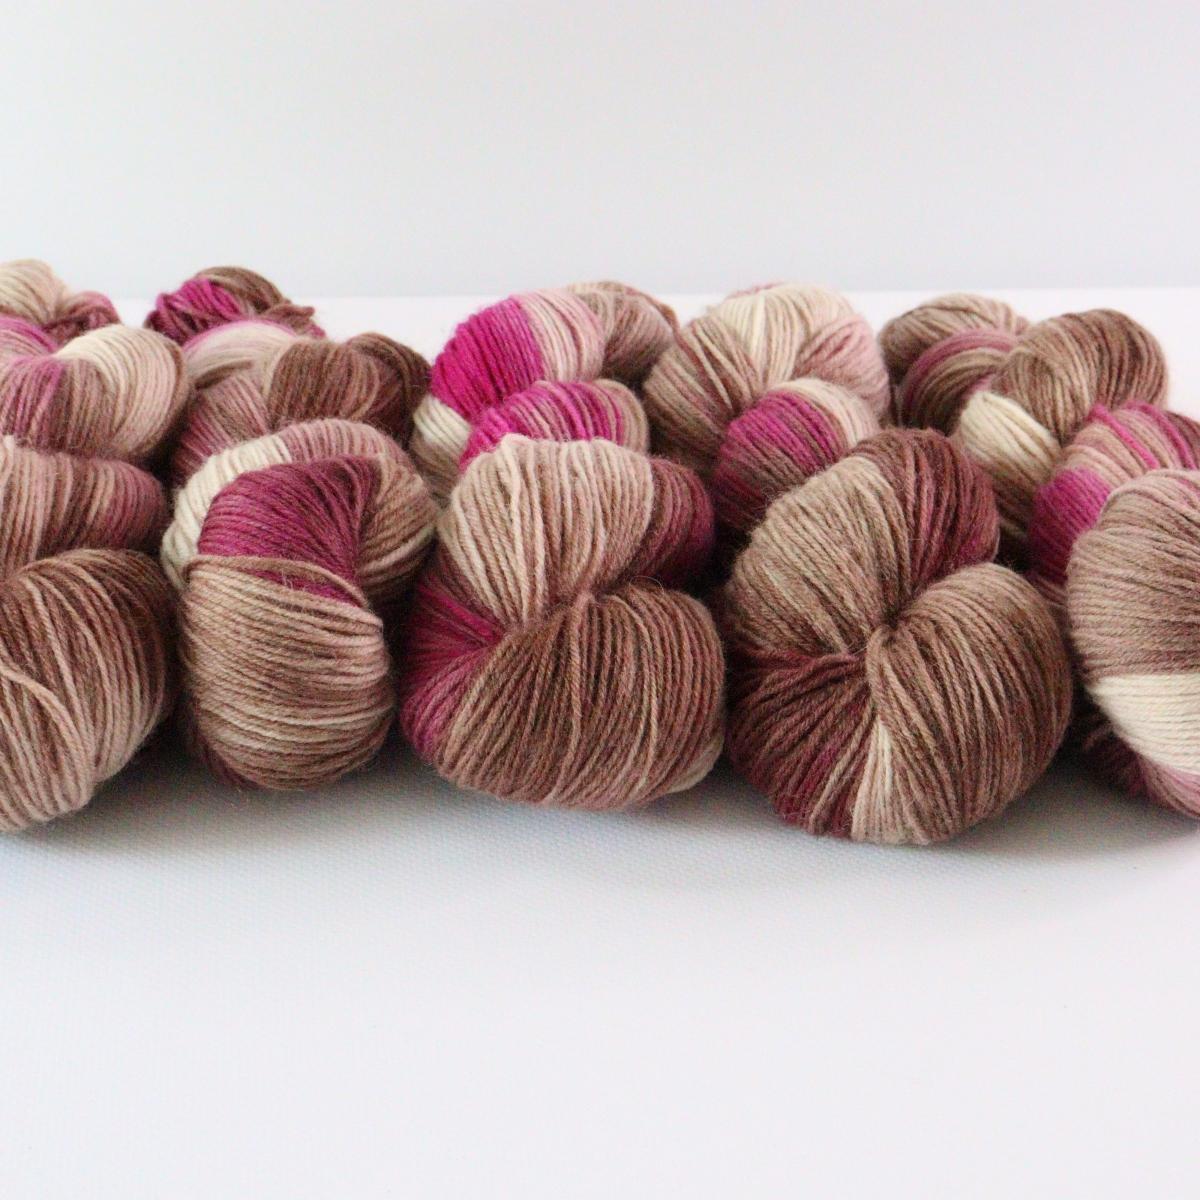 woodico.pro hand dyed yarn 073 2 1200x1200 - Hand dyed yarn / 073